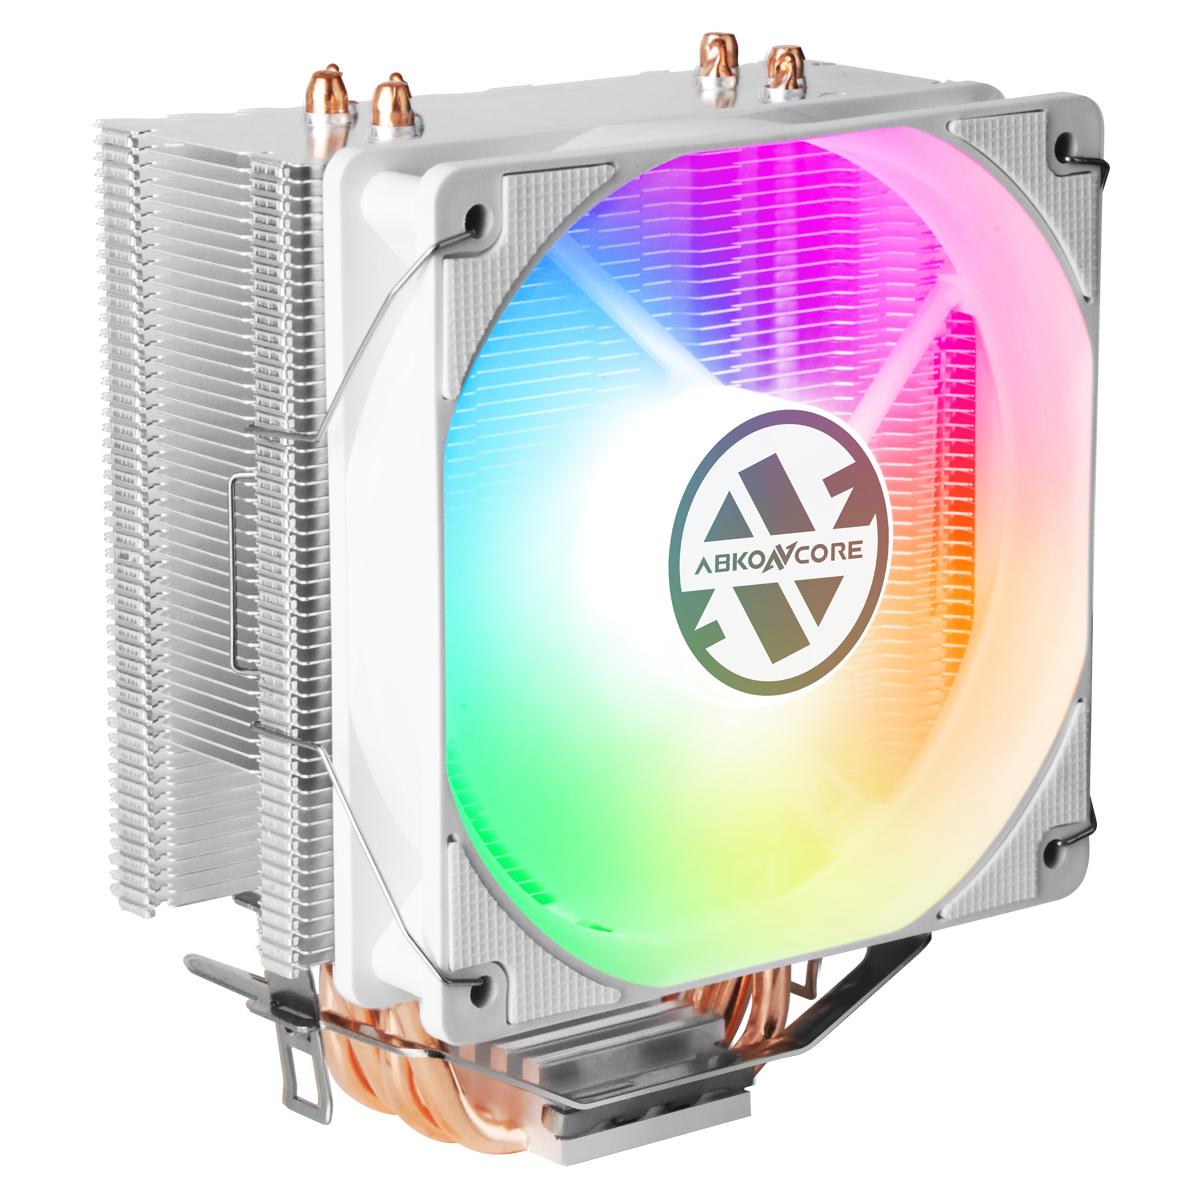 CPU Cooler T405 en color blanco ángulo izq